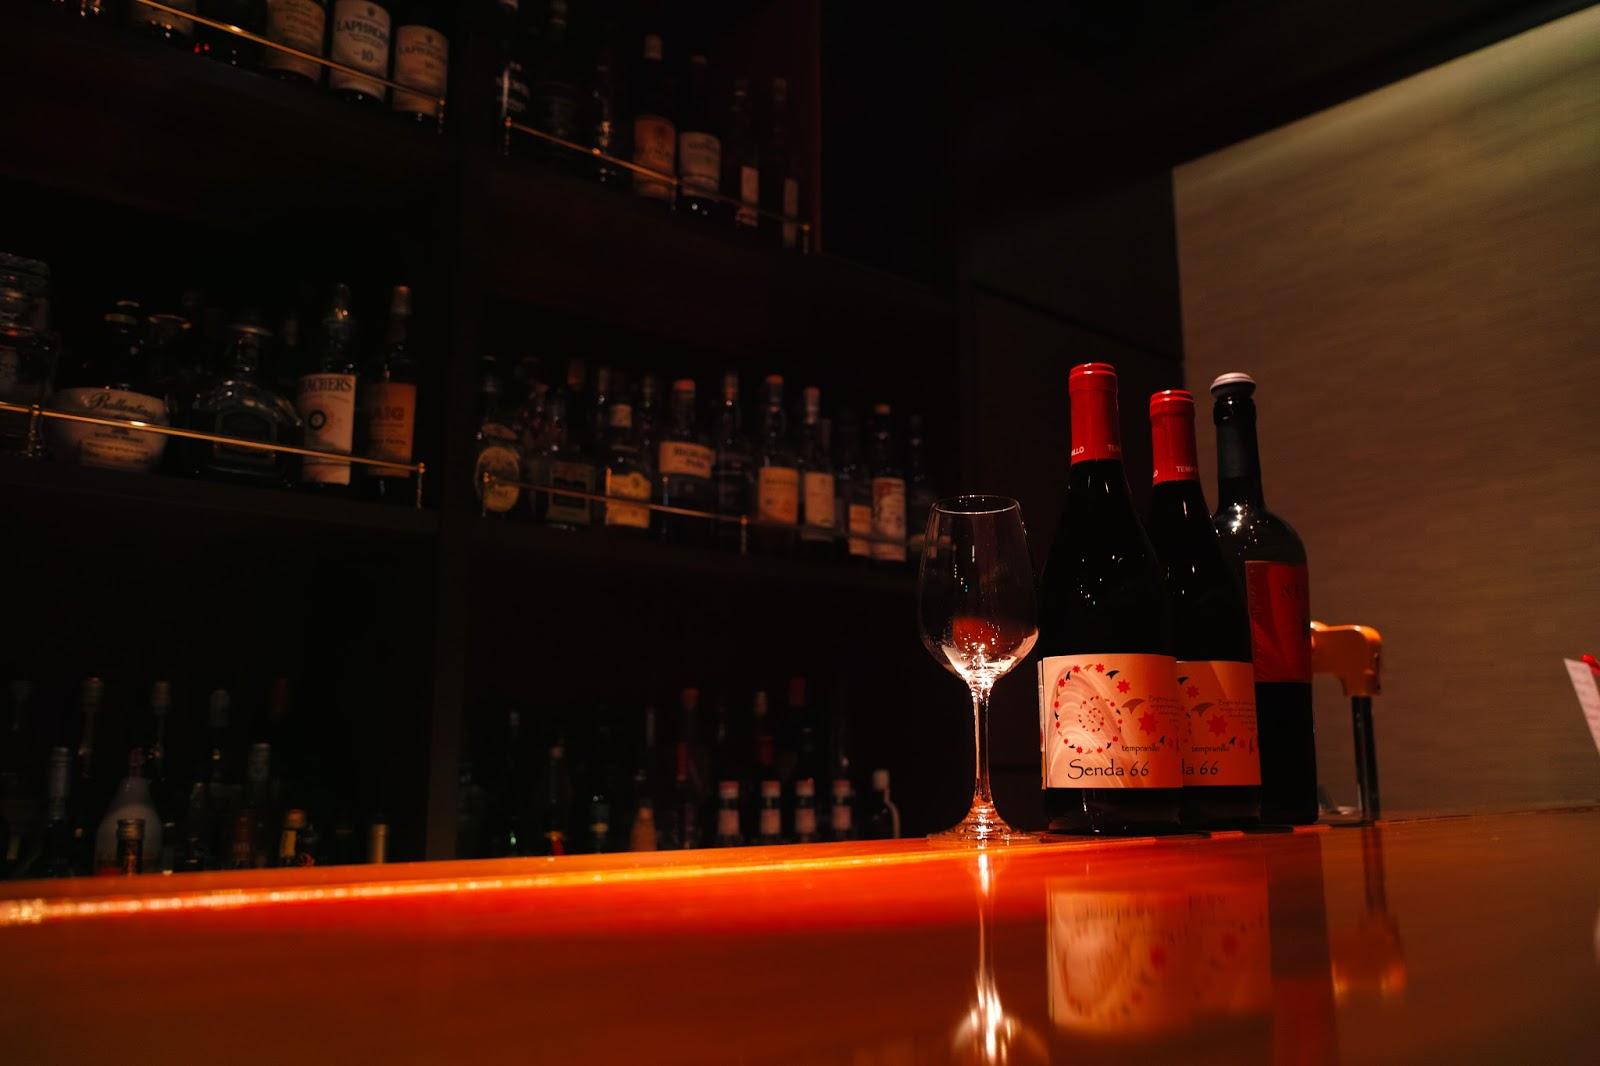 Bar SENDA